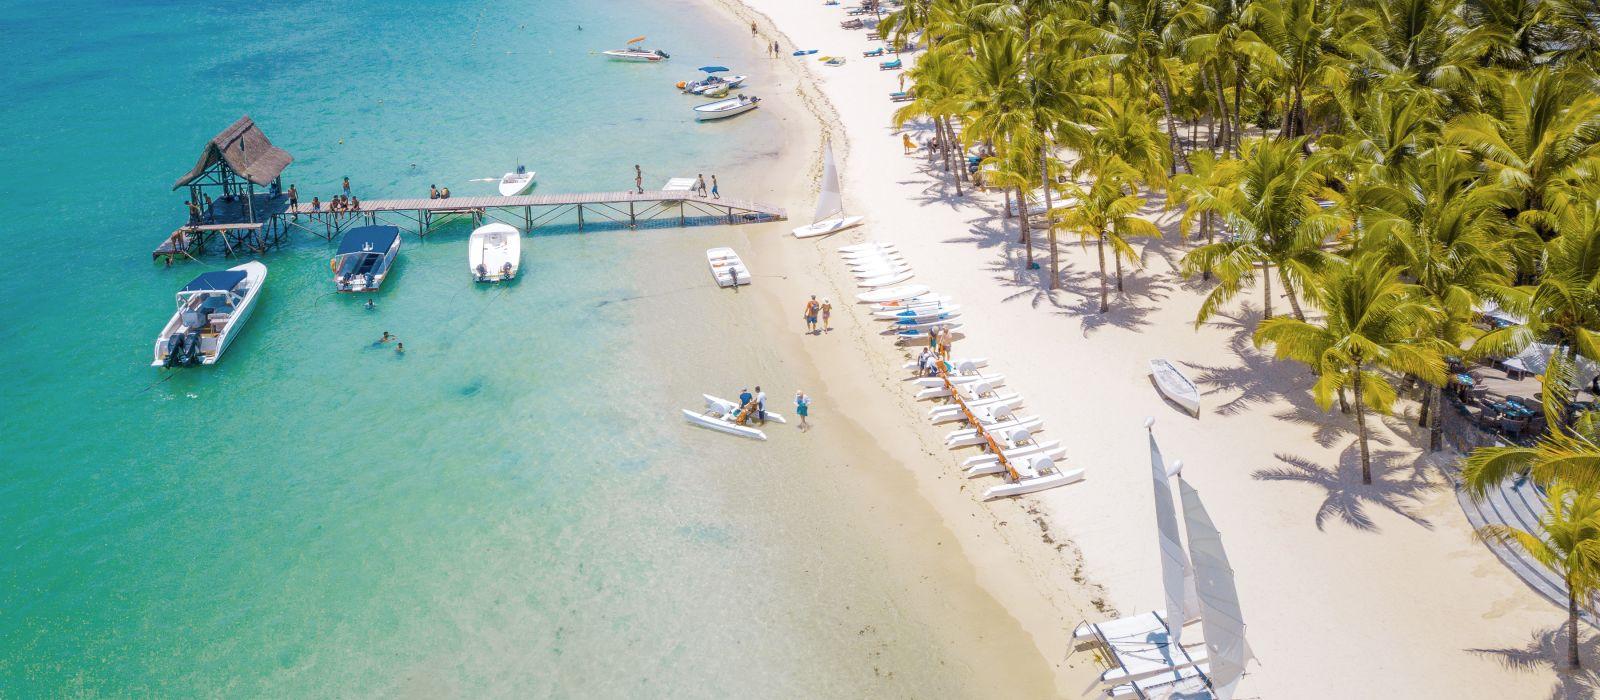 Aerial view on beautiful beach in Trou aux Biches, Mauritius